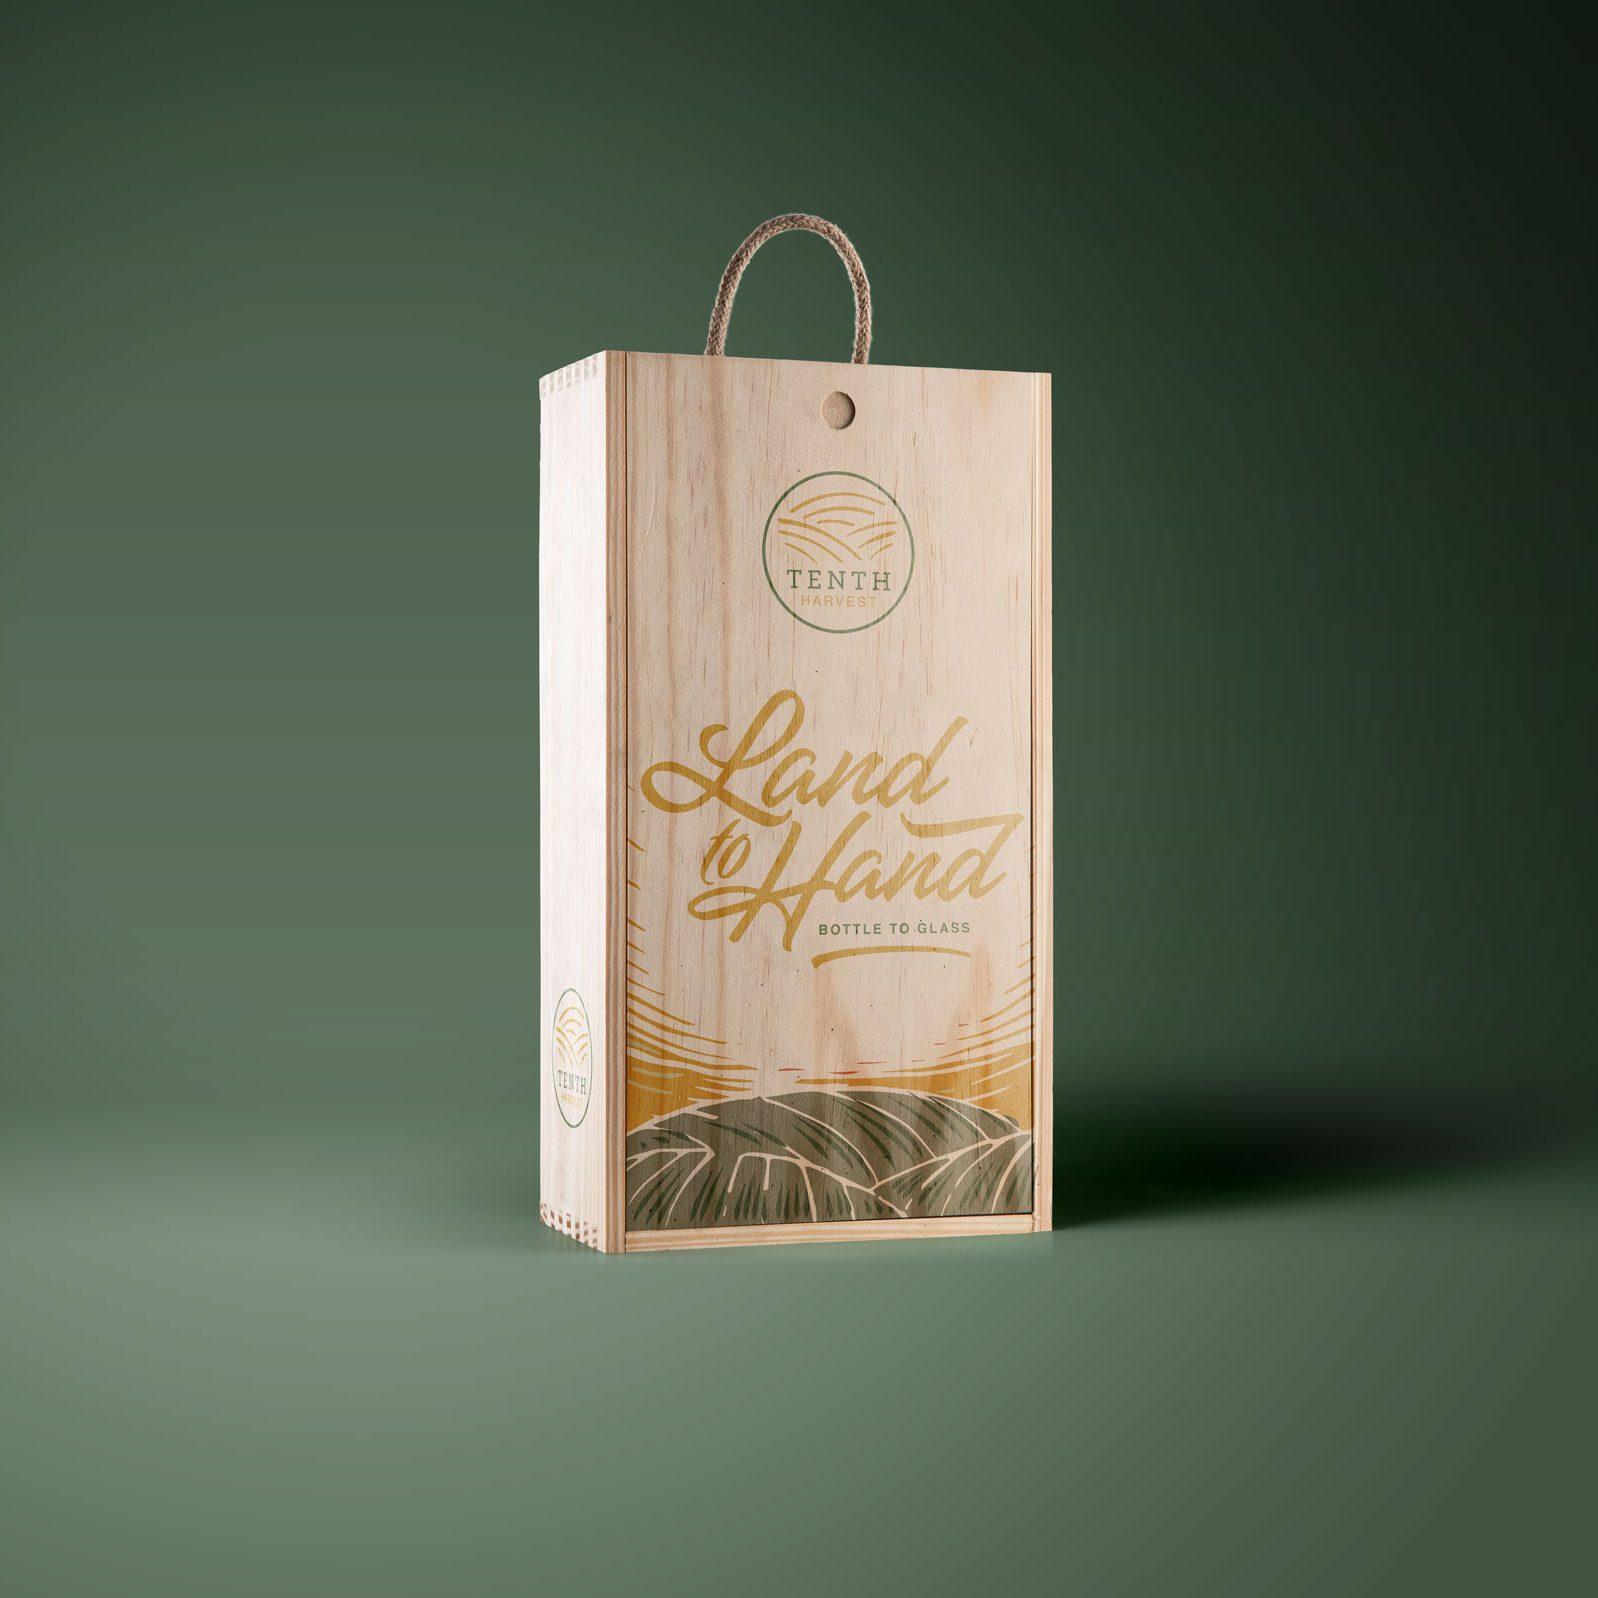 Tenth Harvest Wine Box